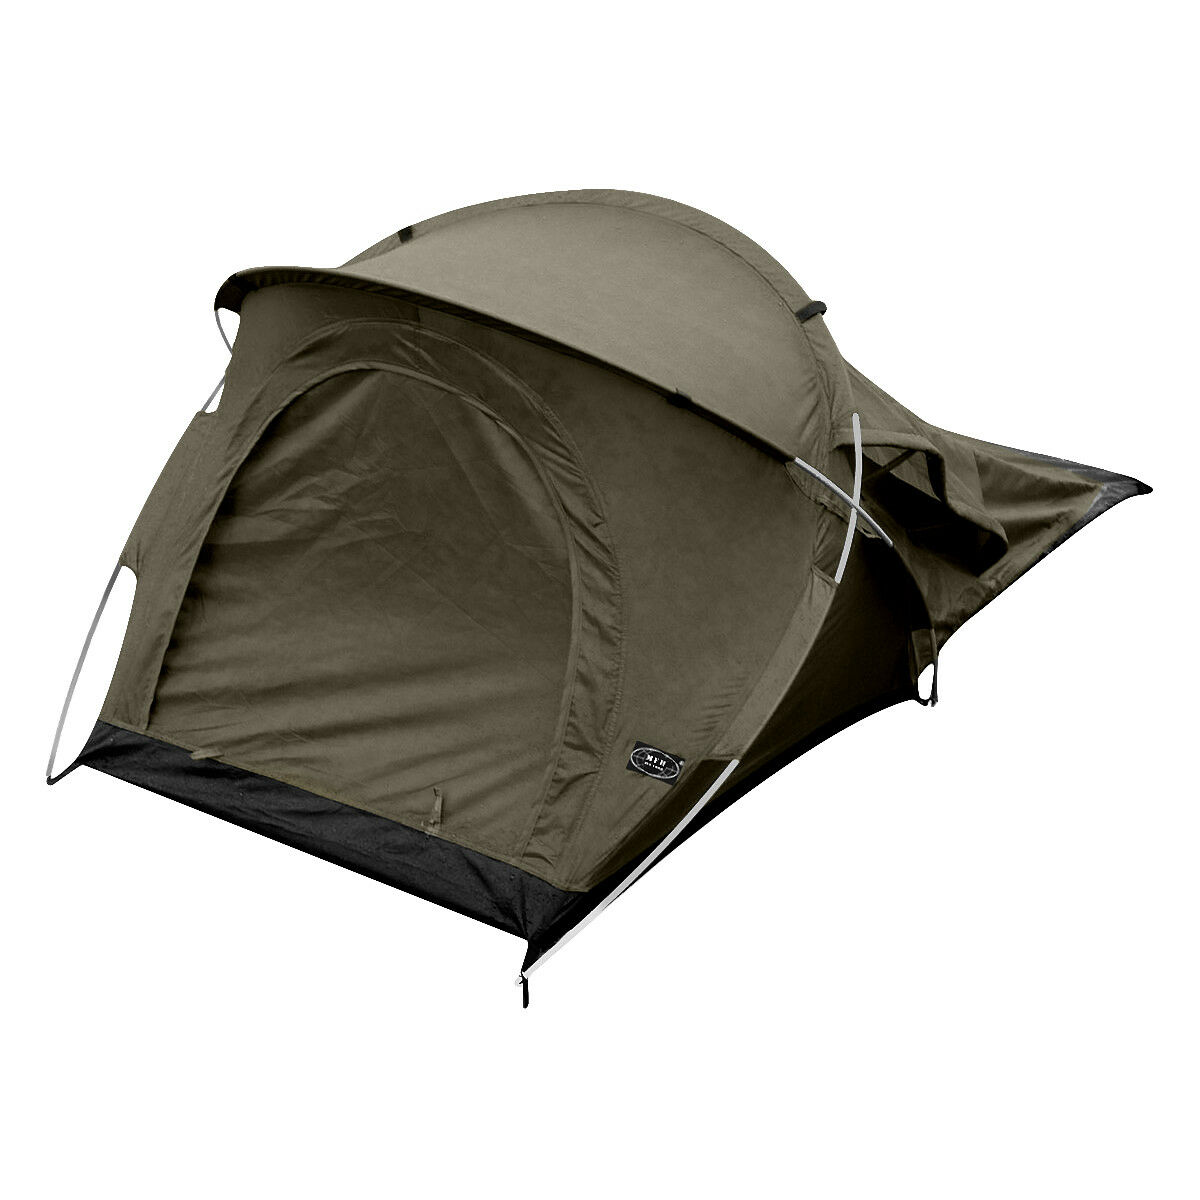 MFH Tent Osser Aluminium Frame Army Festivals Outdoor Walking 1 Person OD Green